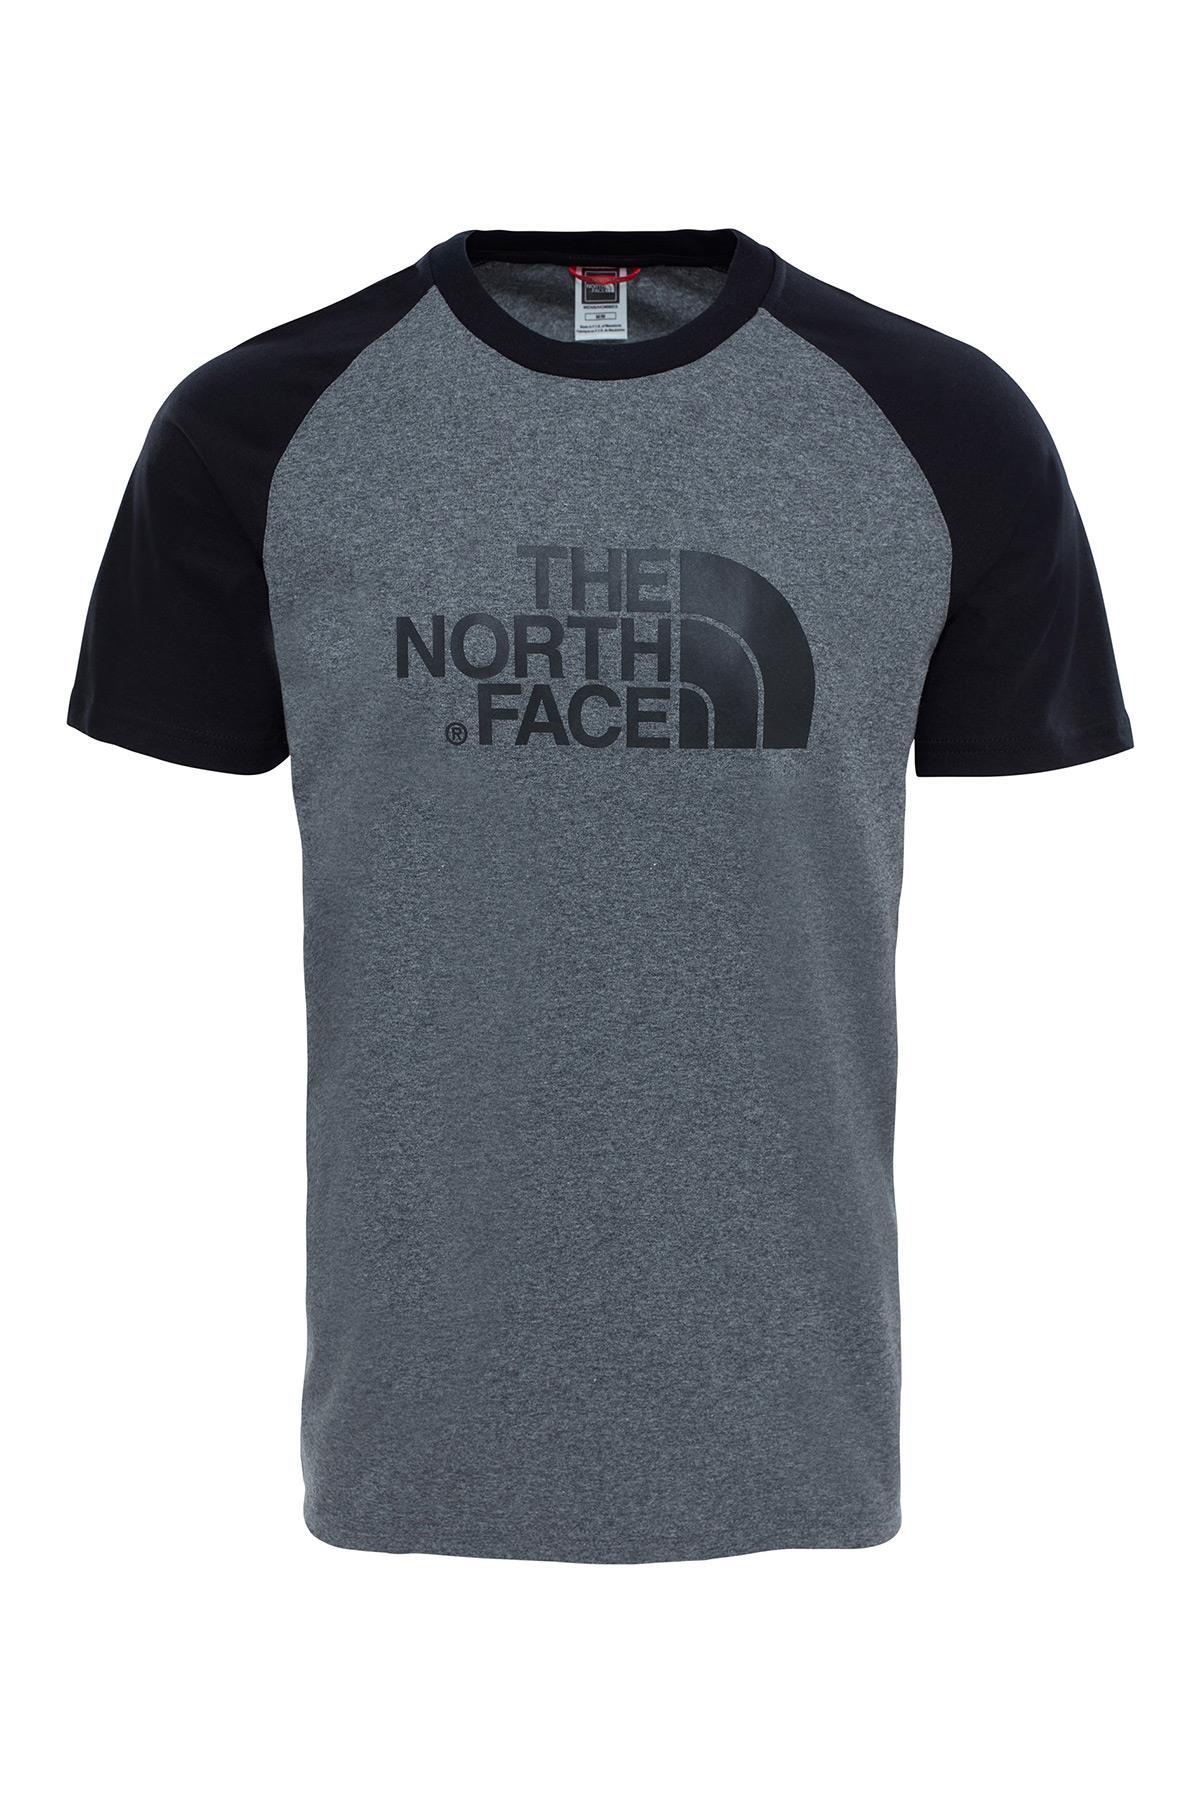 The Northface Erkek Ss Raglan Easy Tee T937Fvjbv Tişört